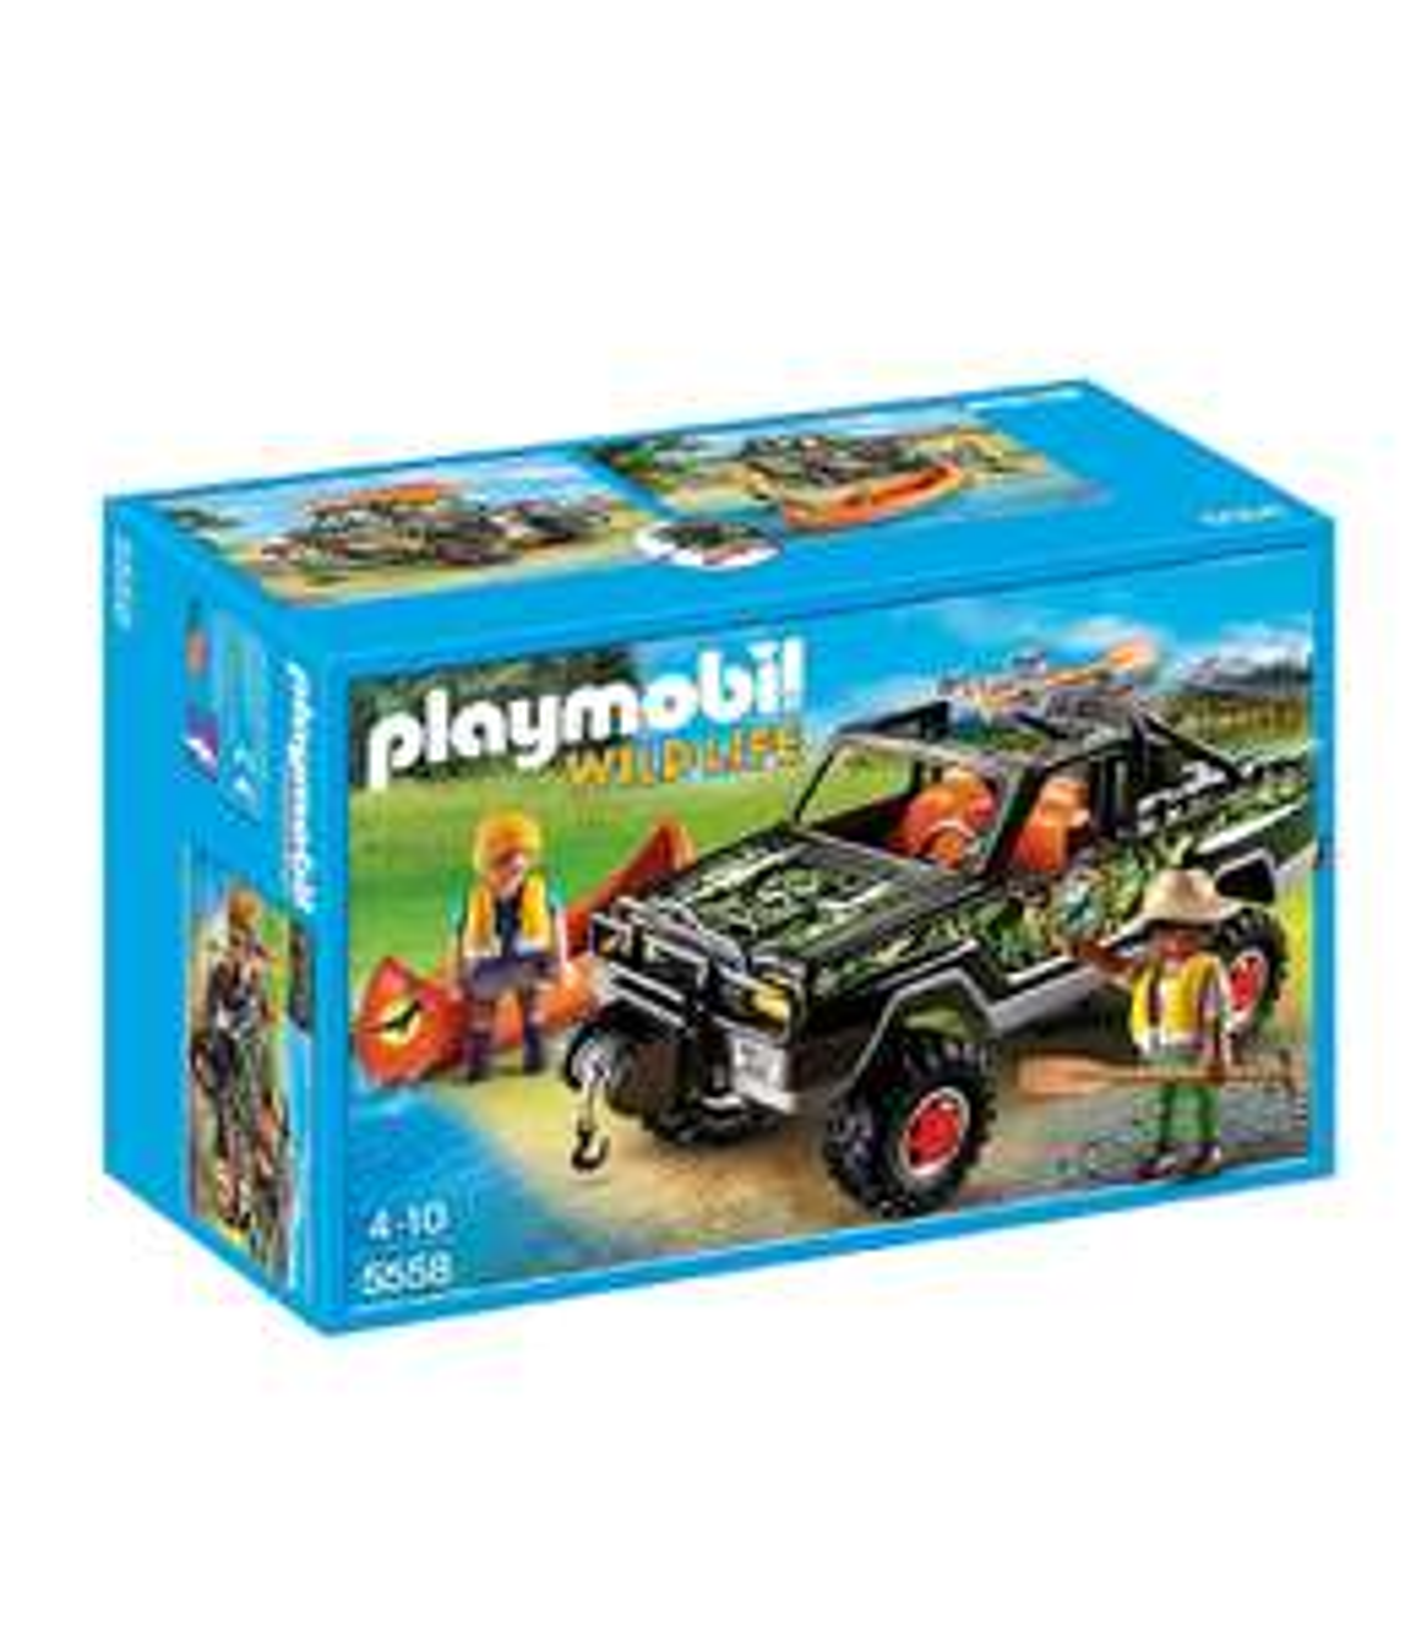 Black Friday 2017 Amazon: Playmobil Pick Up Truck